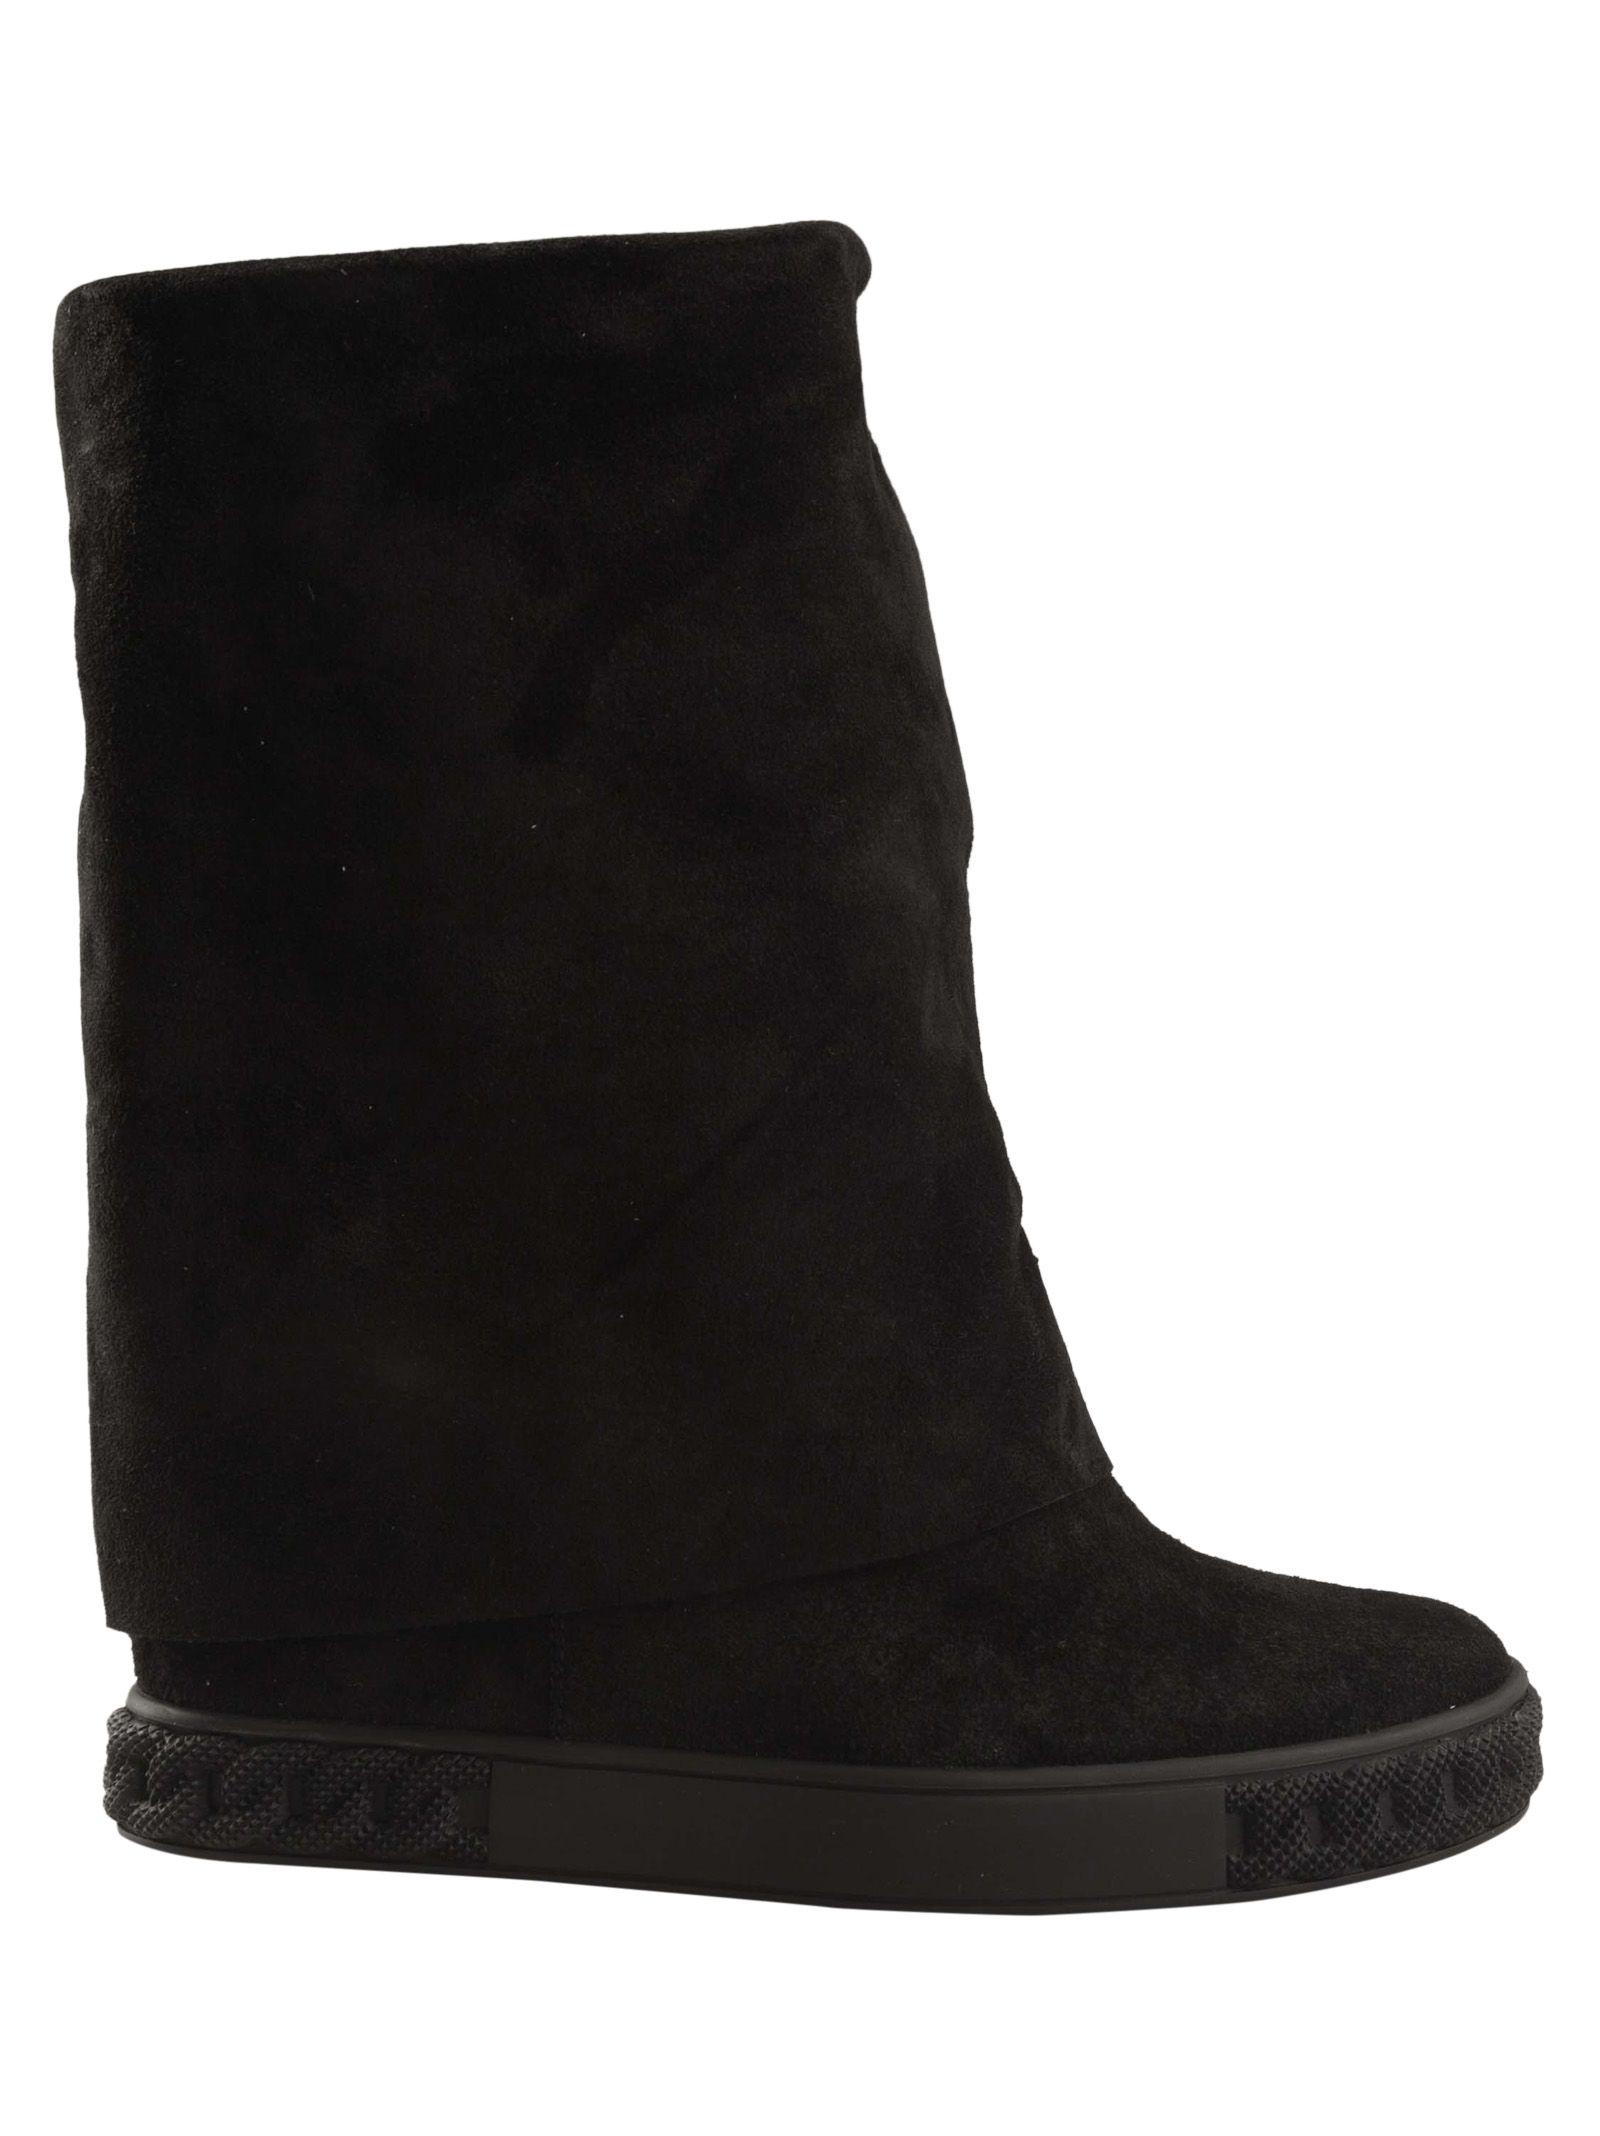 Casadei Chain Motif Boots